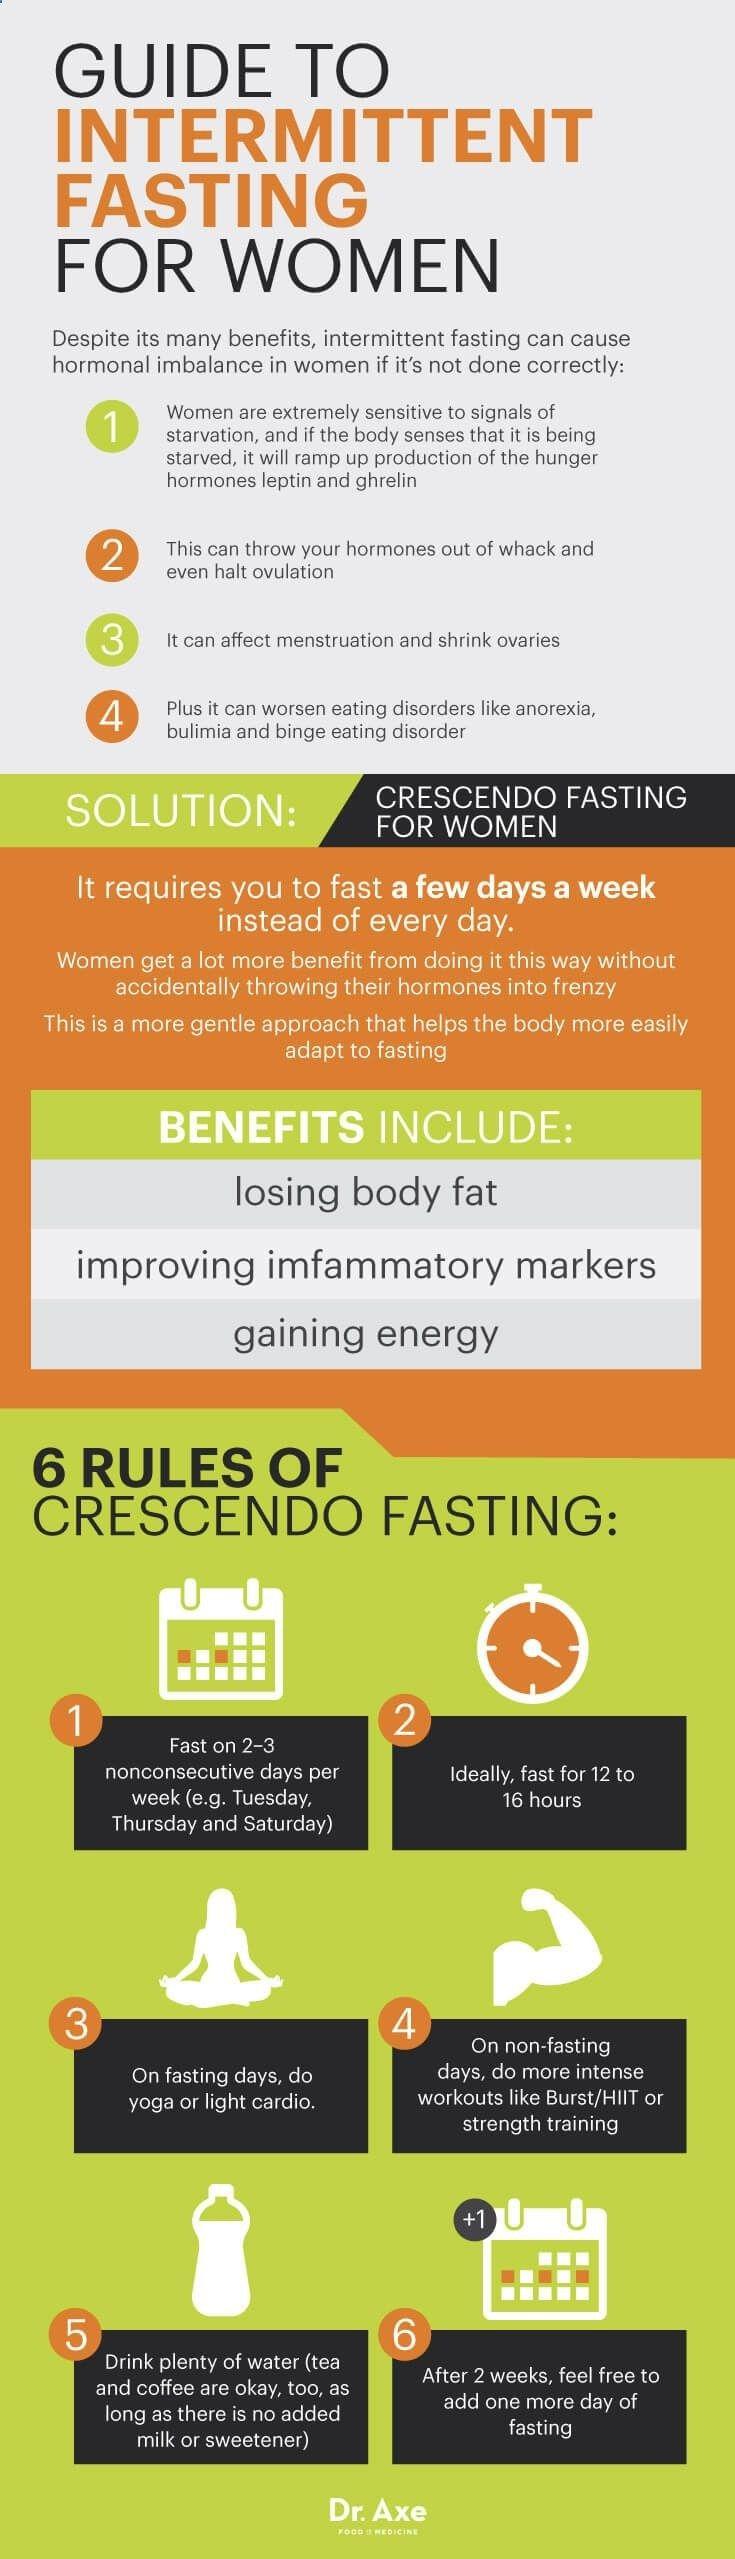 Crescendo fasting - Dr. Axe www.draxe.com #health #holistic #natural